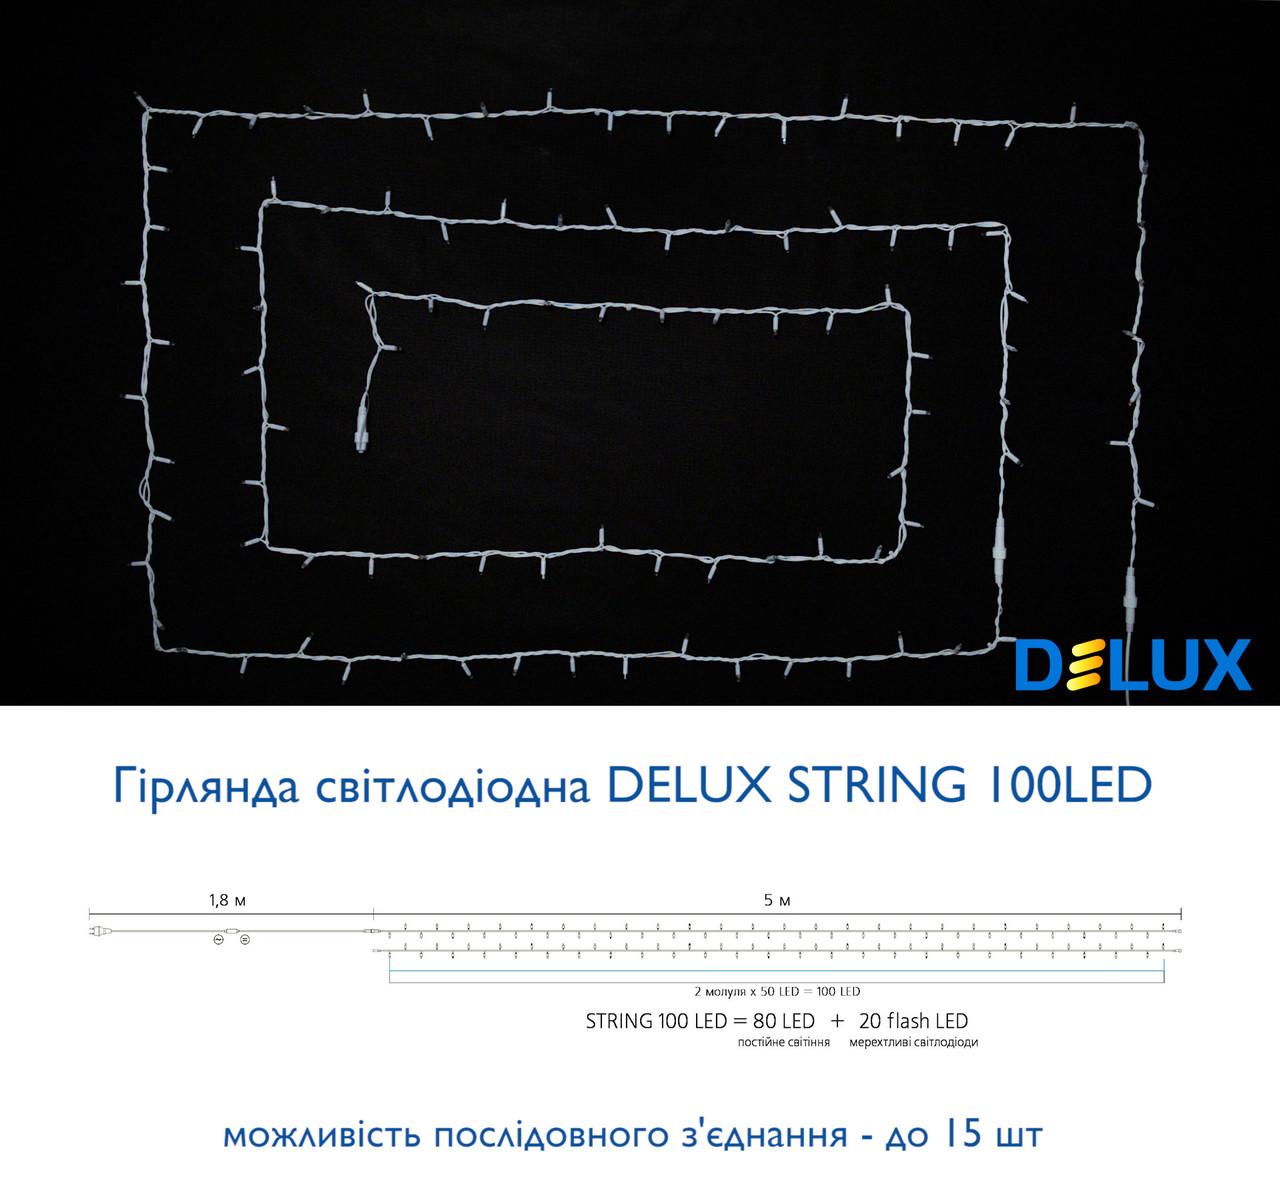 Гирлянда уличная DELUX STRING 100LED 10m (2*5m) 20 flash зелен/бел IP44 EN